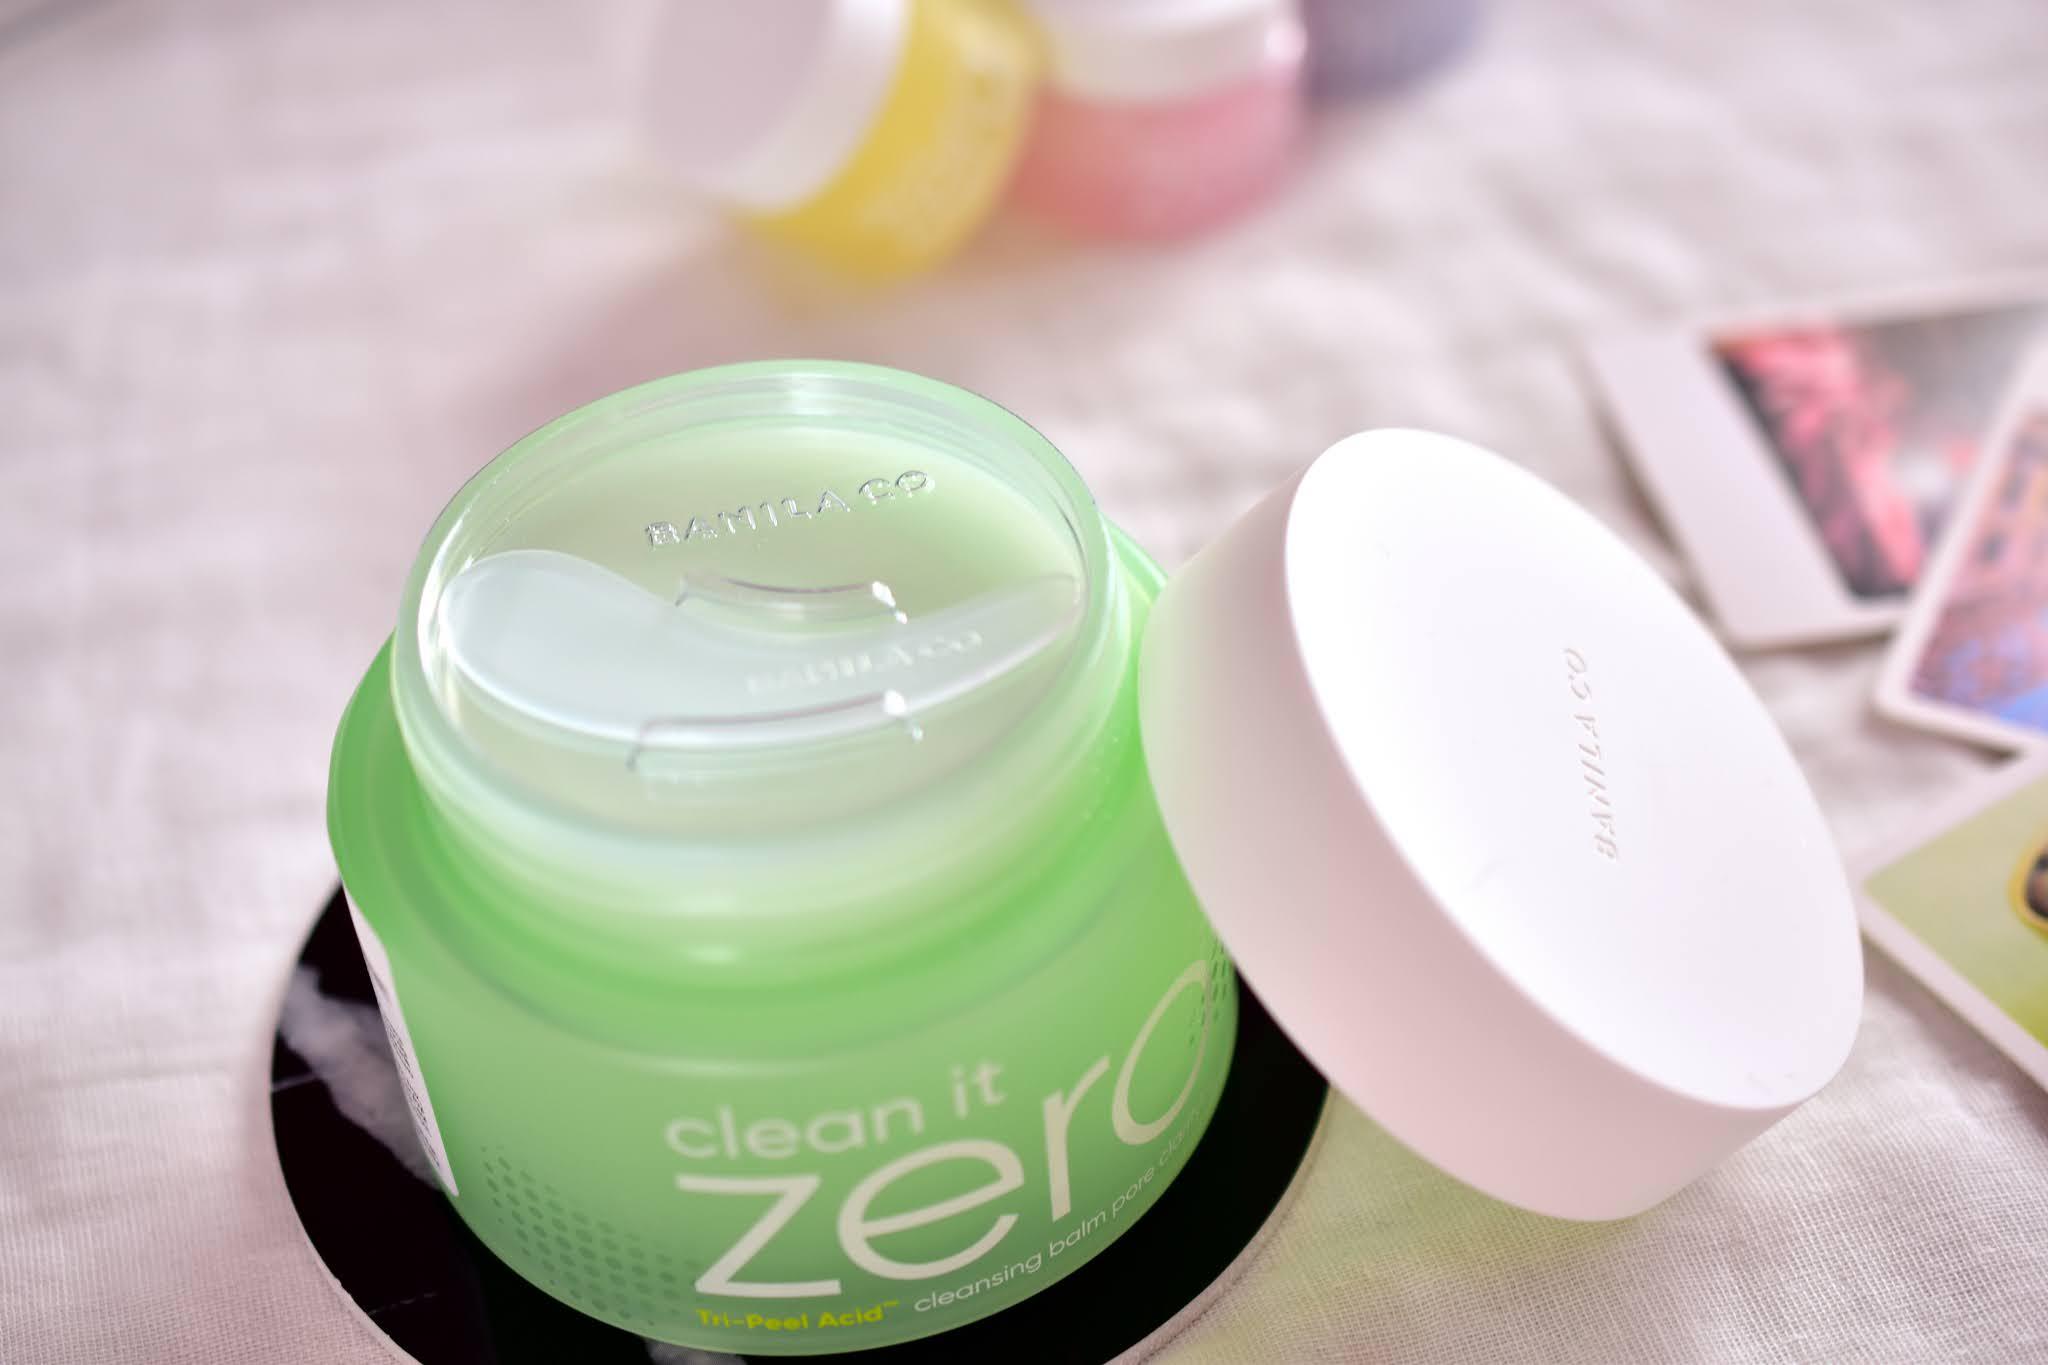 Banila Co Clean It Zero Tri Peel Acid